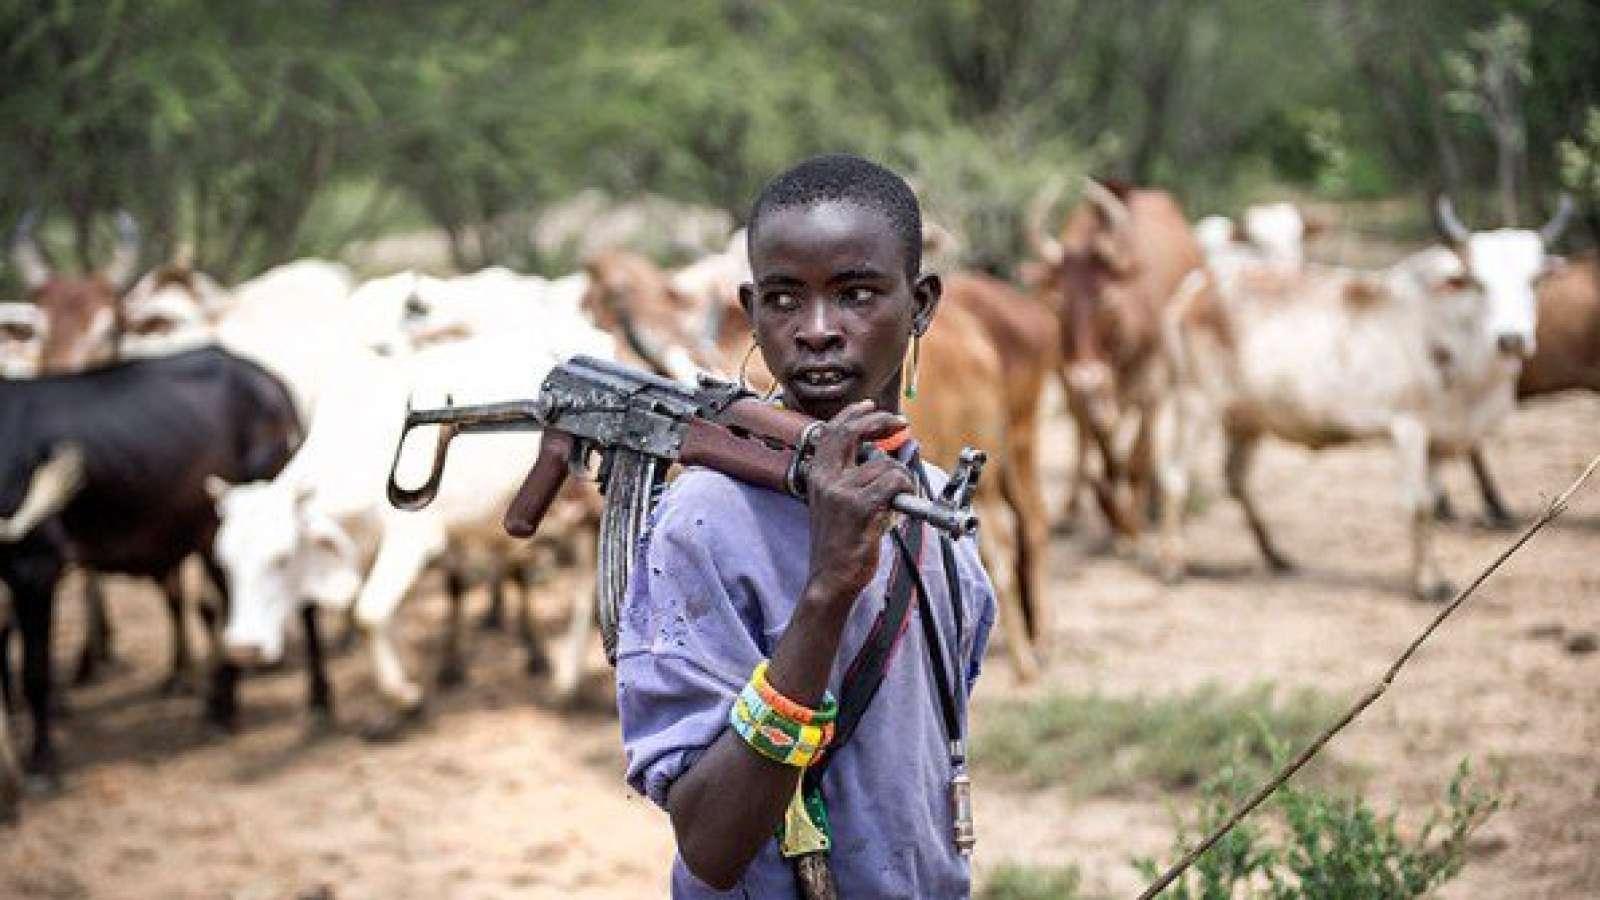 Fulani Herdsman Armed With AK-47